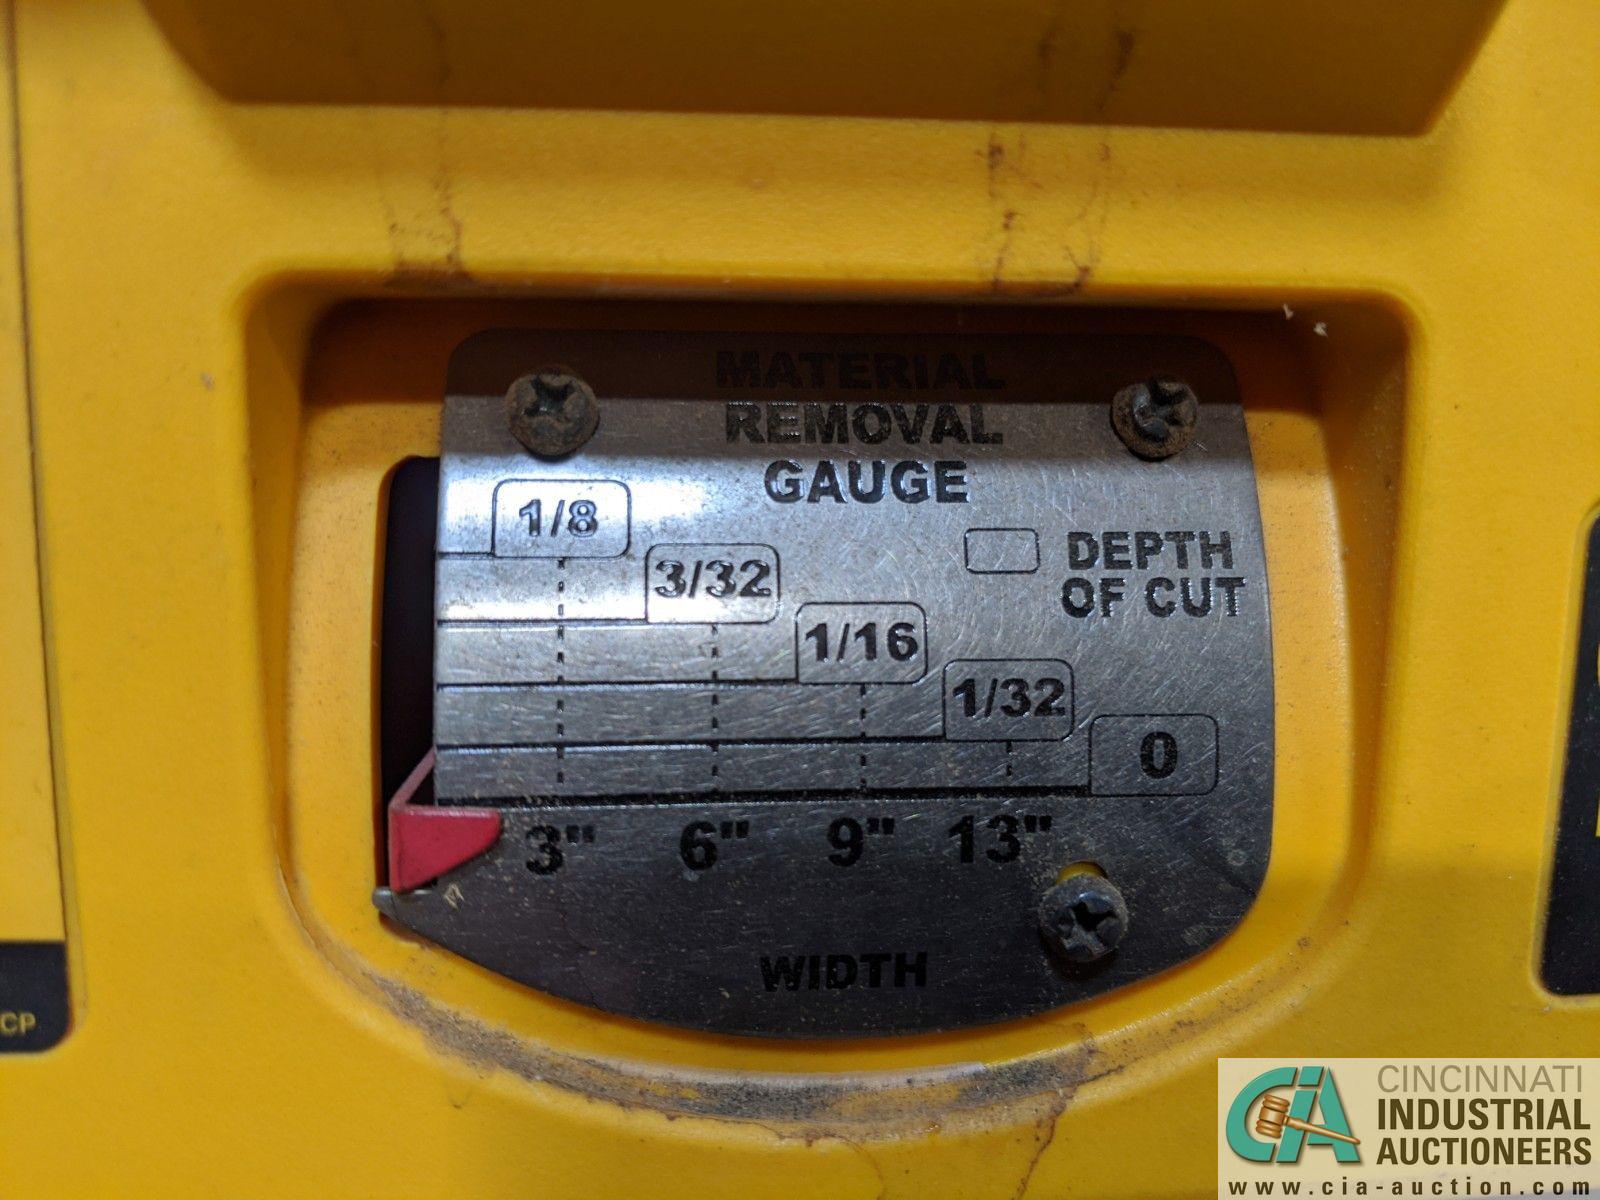 "13"" THICKNESS DEWALT MODEL DW735 PLANER; S/N 2007-52-CTI94585 (8635 East Ave., Mentor, OH 44060 - - Image 5 of 6"